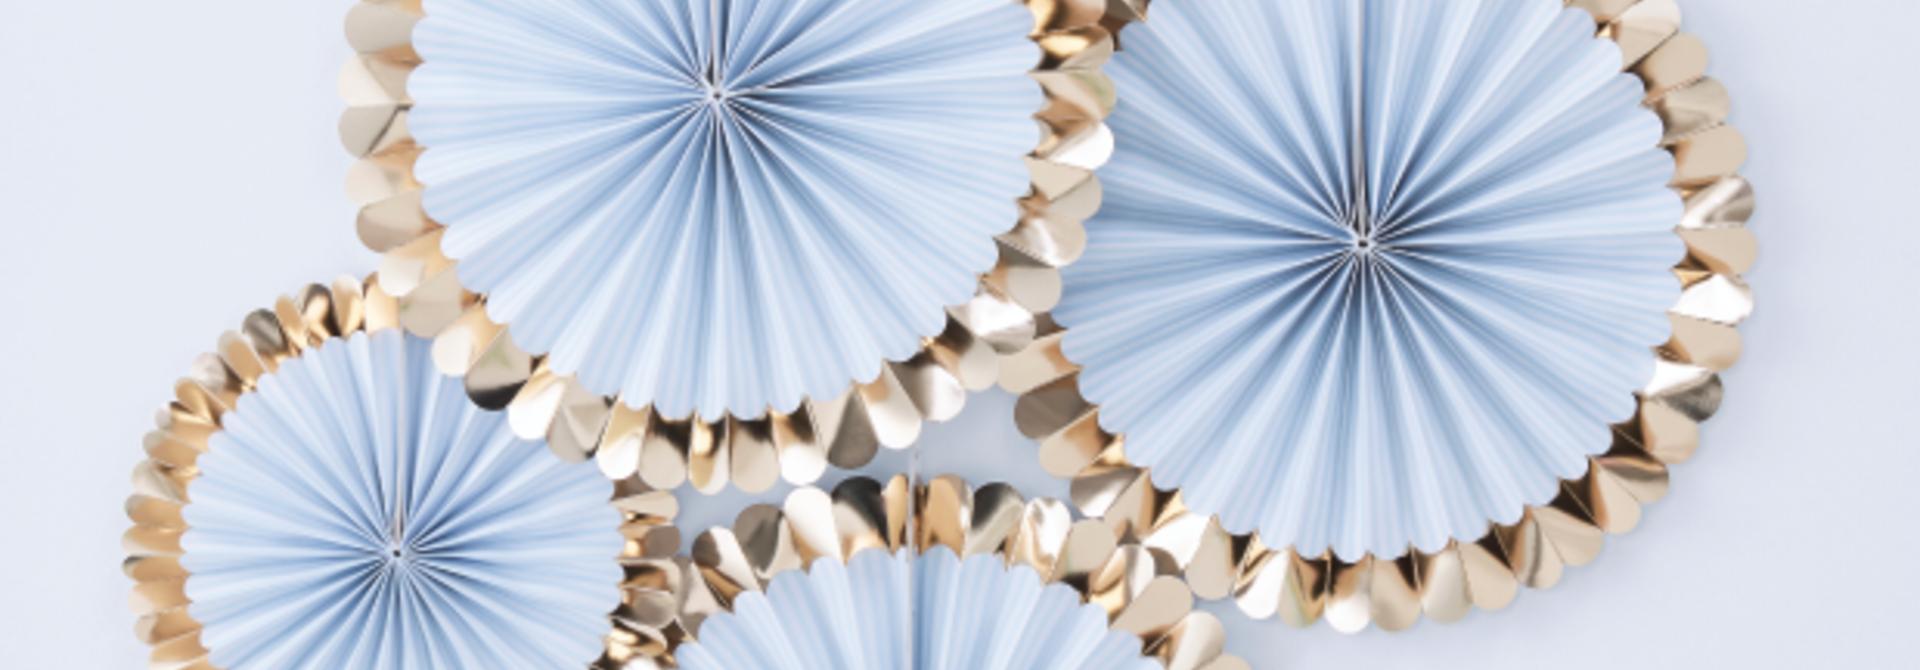 Paper fans lichtblauw goud (5 st) - Ginger Ray